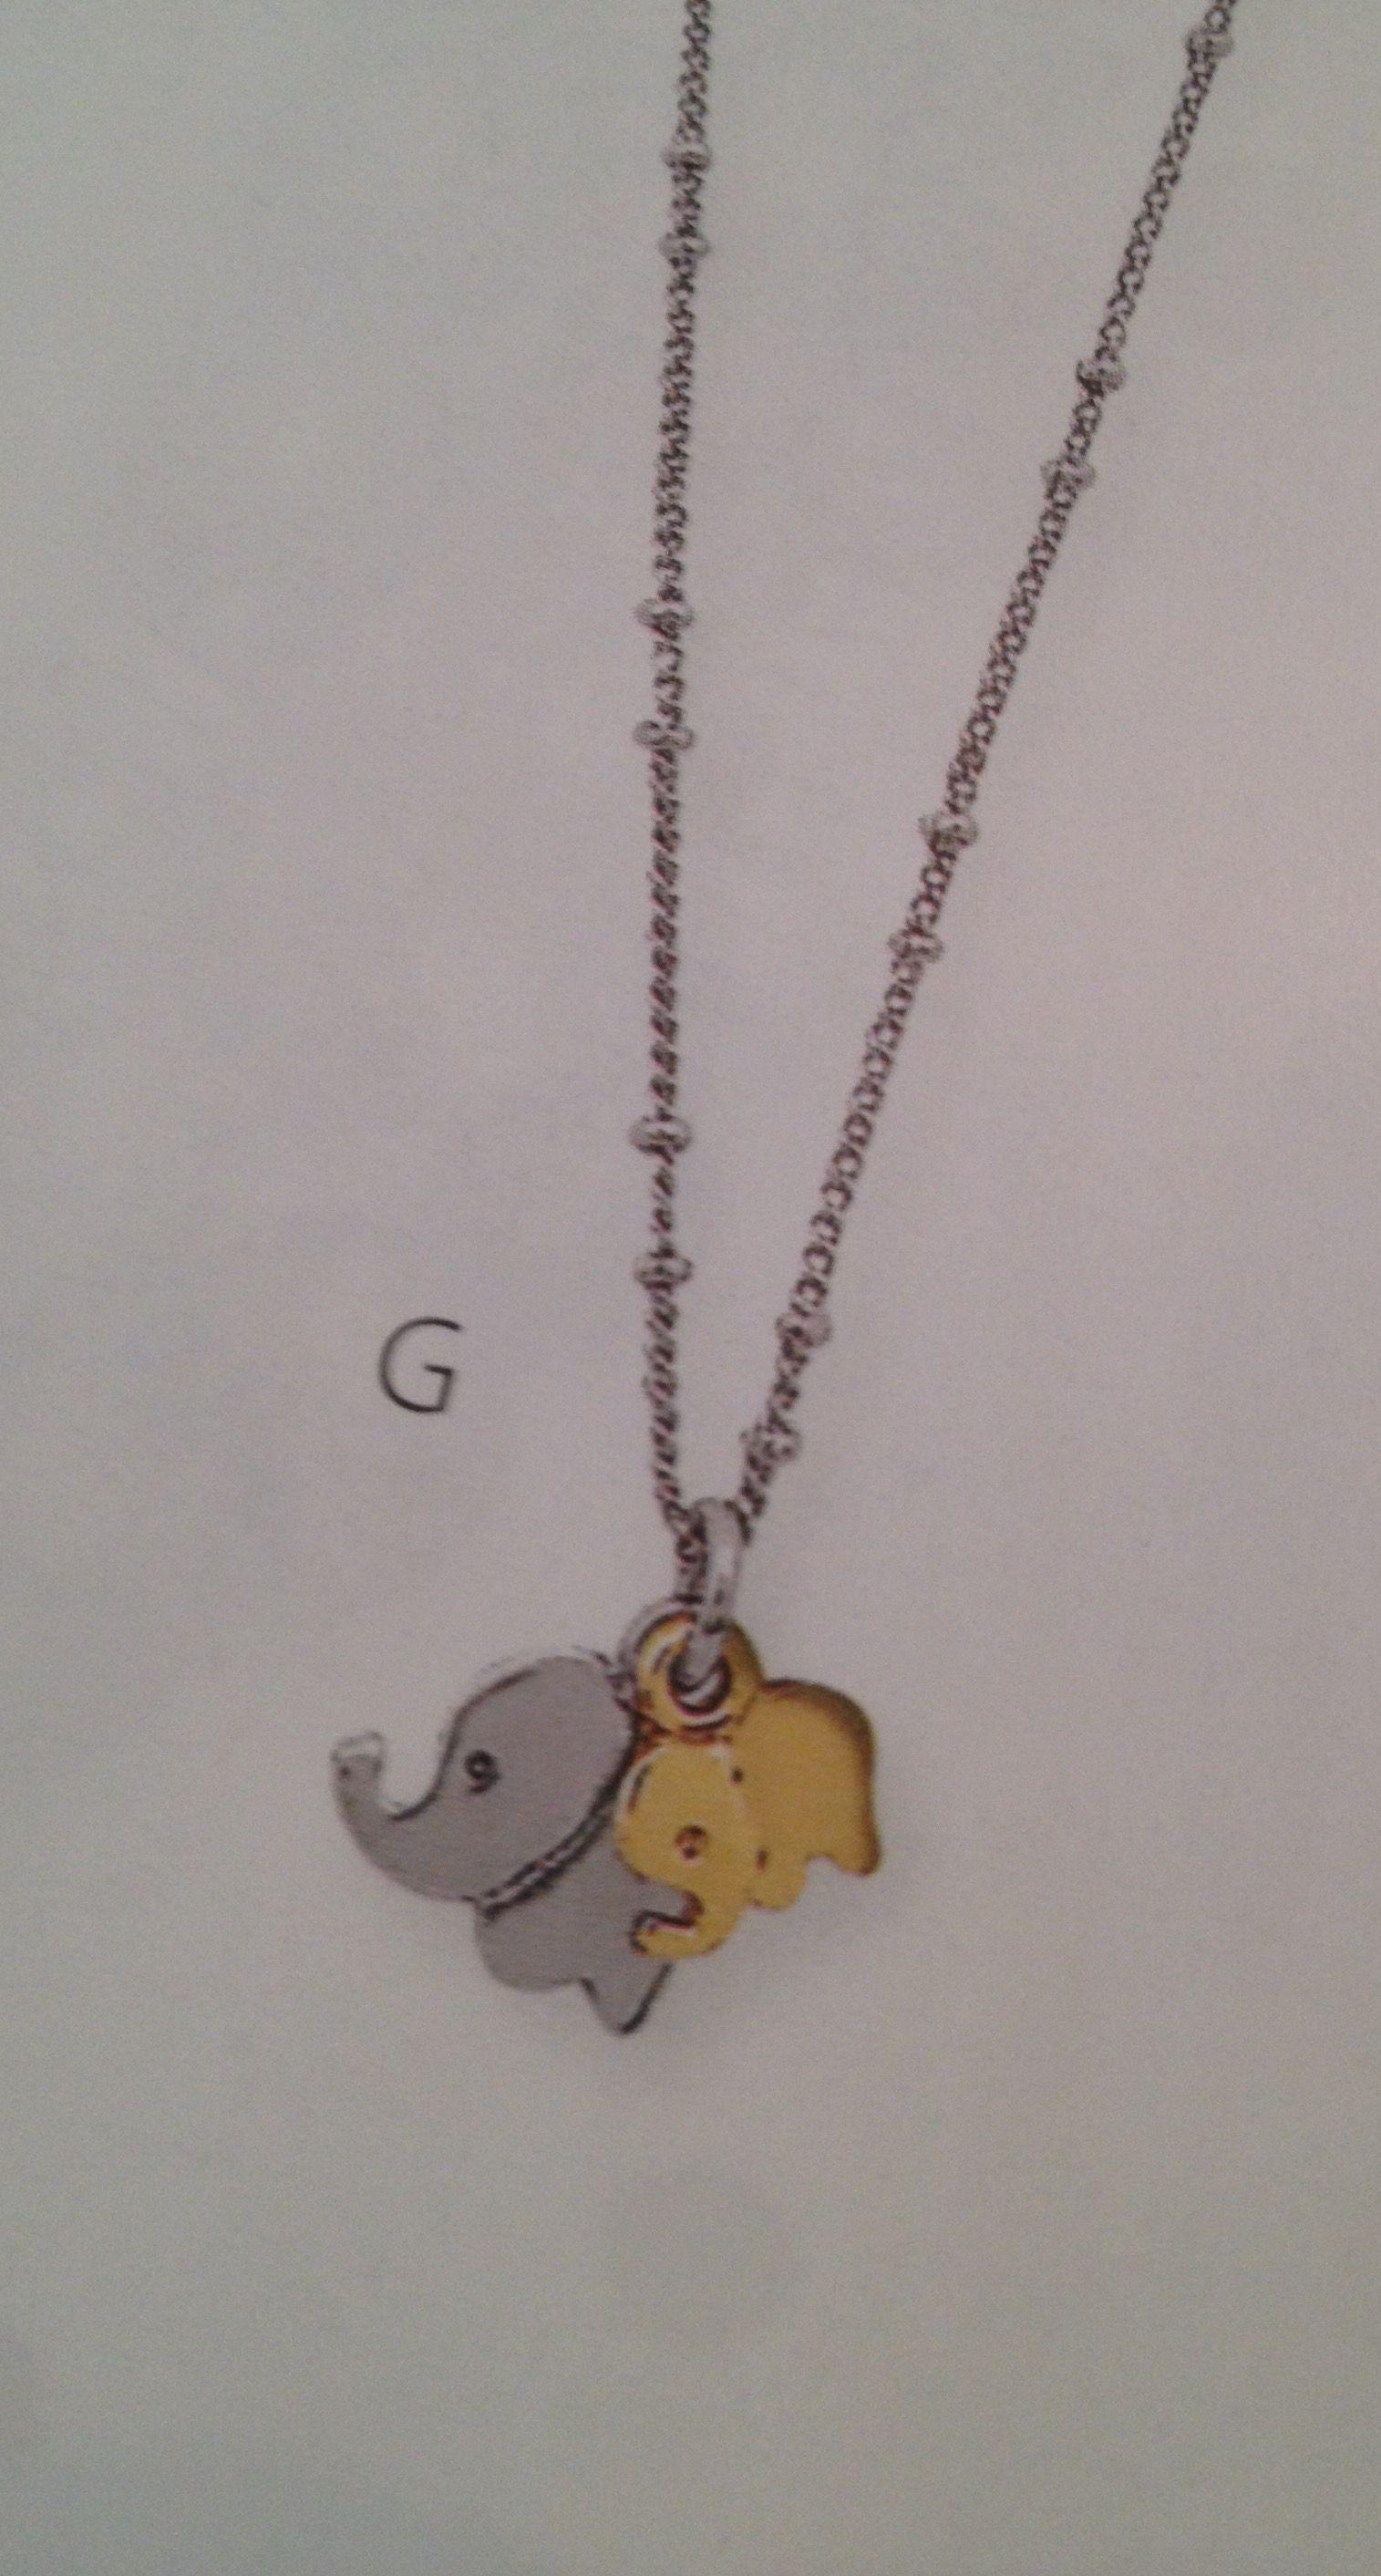 Premier designs jewelry 2015 - Fall 2015